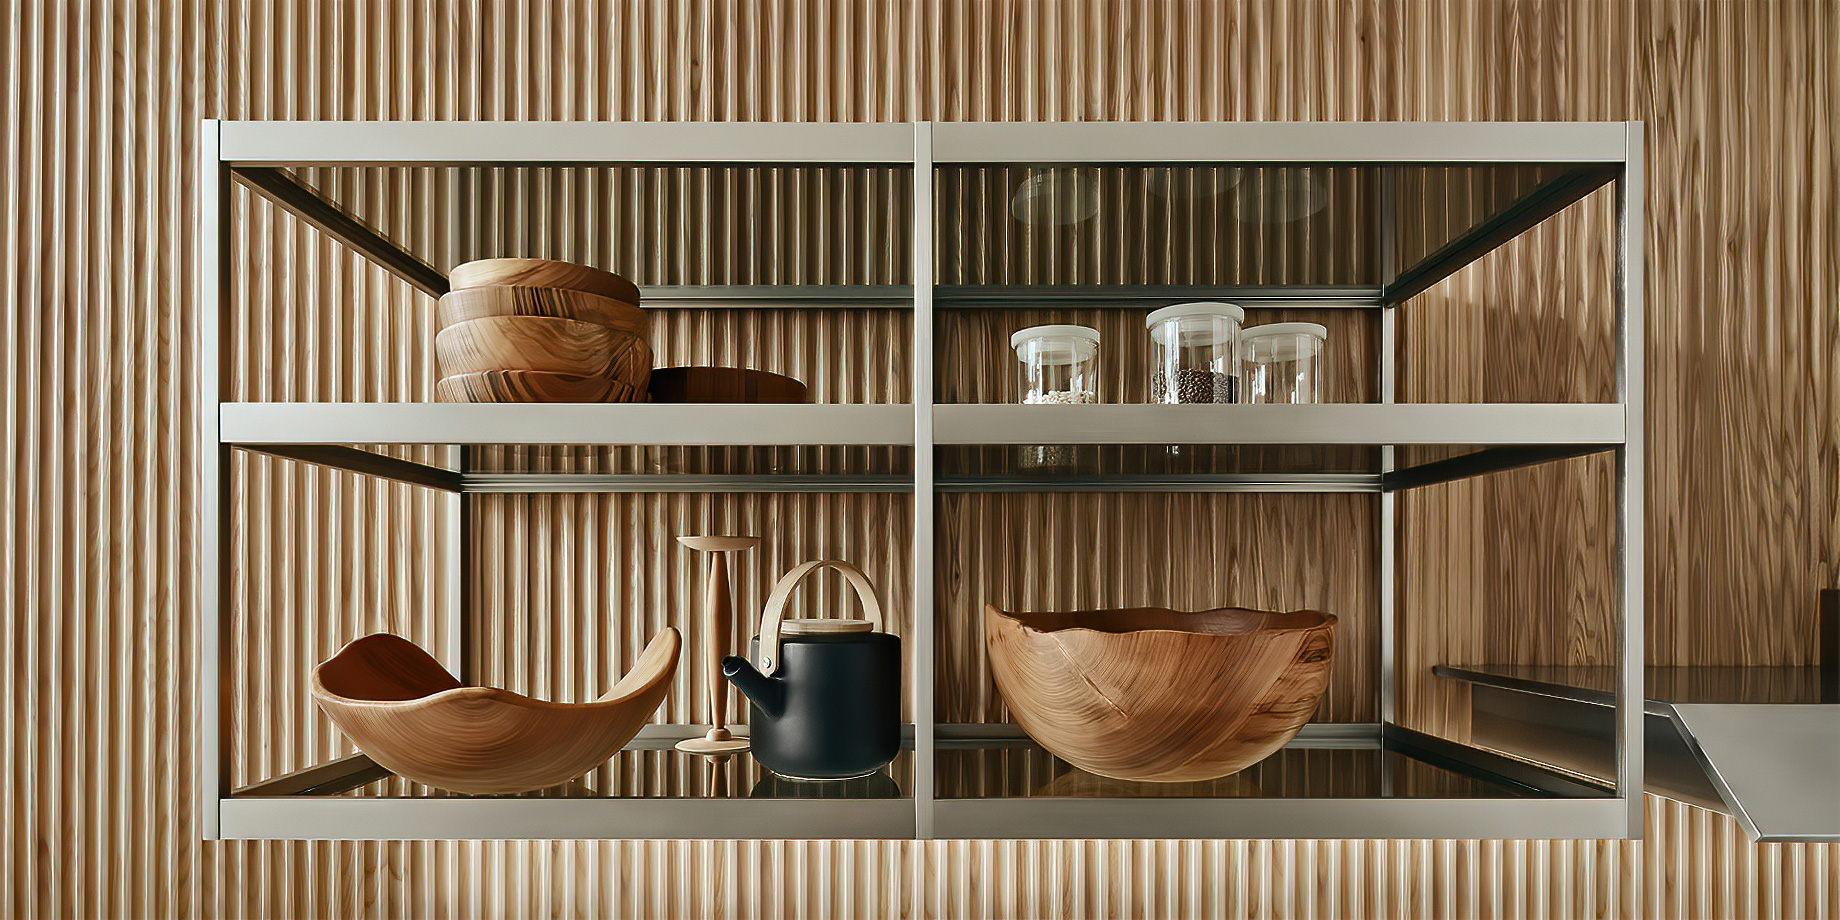 K-lab Contemporary Kitchen Ernestomeda Italy – Giuseppe Bavuso – K-System Wall Unit